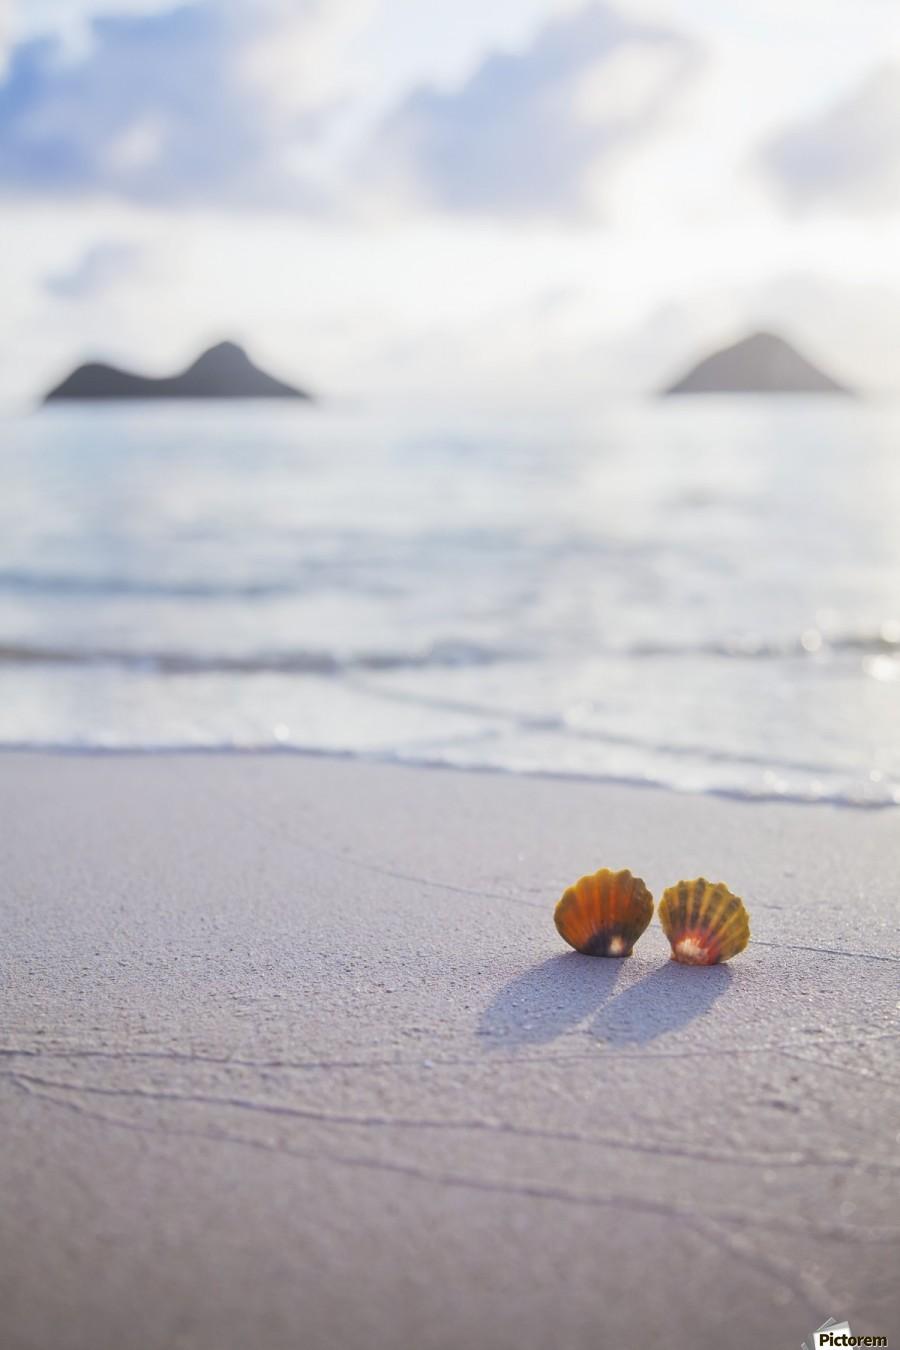 A set of two rare Hawaiian Sunrise Scallop Seashells, also known as Pecten Langfordi, in the sand at Lanikai beach, with Mokulua islands in background; Honolulu, Oahu, Hawaii, United States of America  Print